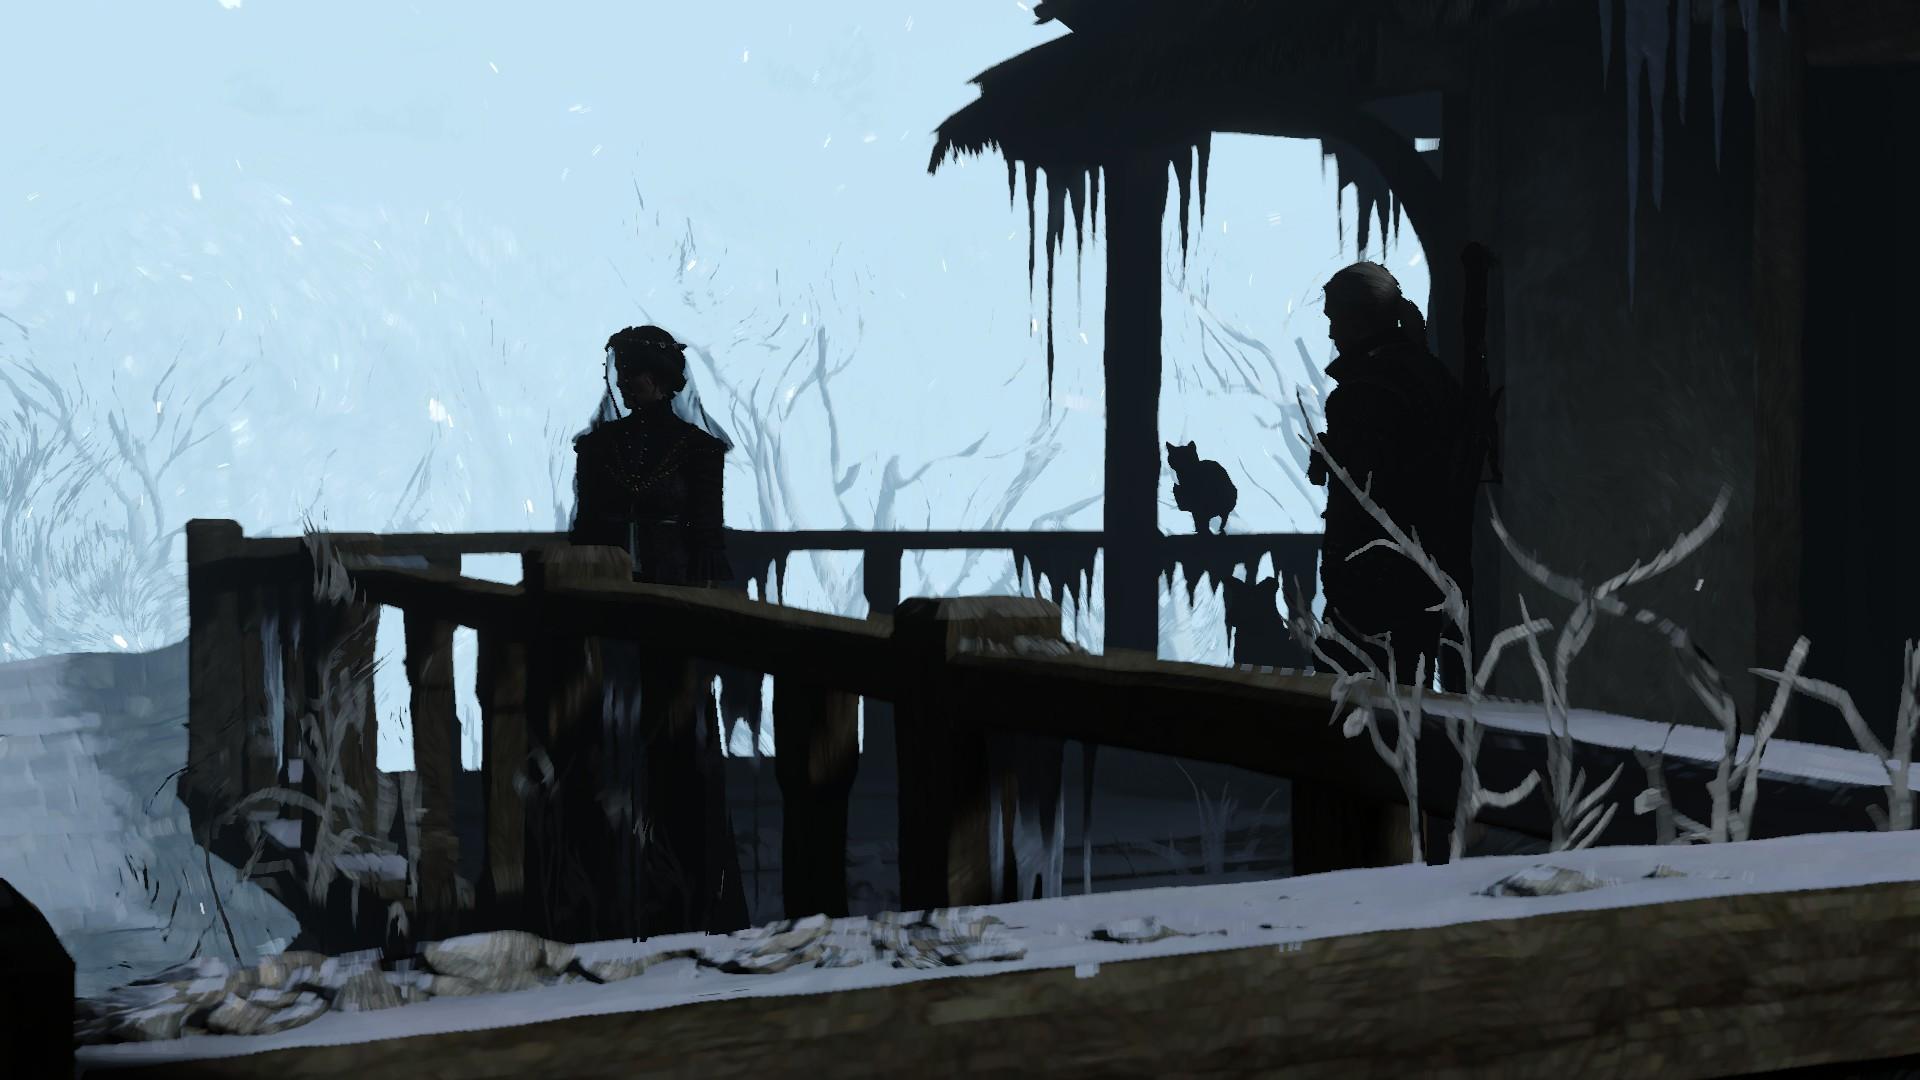 292030_screenshots_20190111184516_1.jpg - Witcher 3: Wild Hunt, the